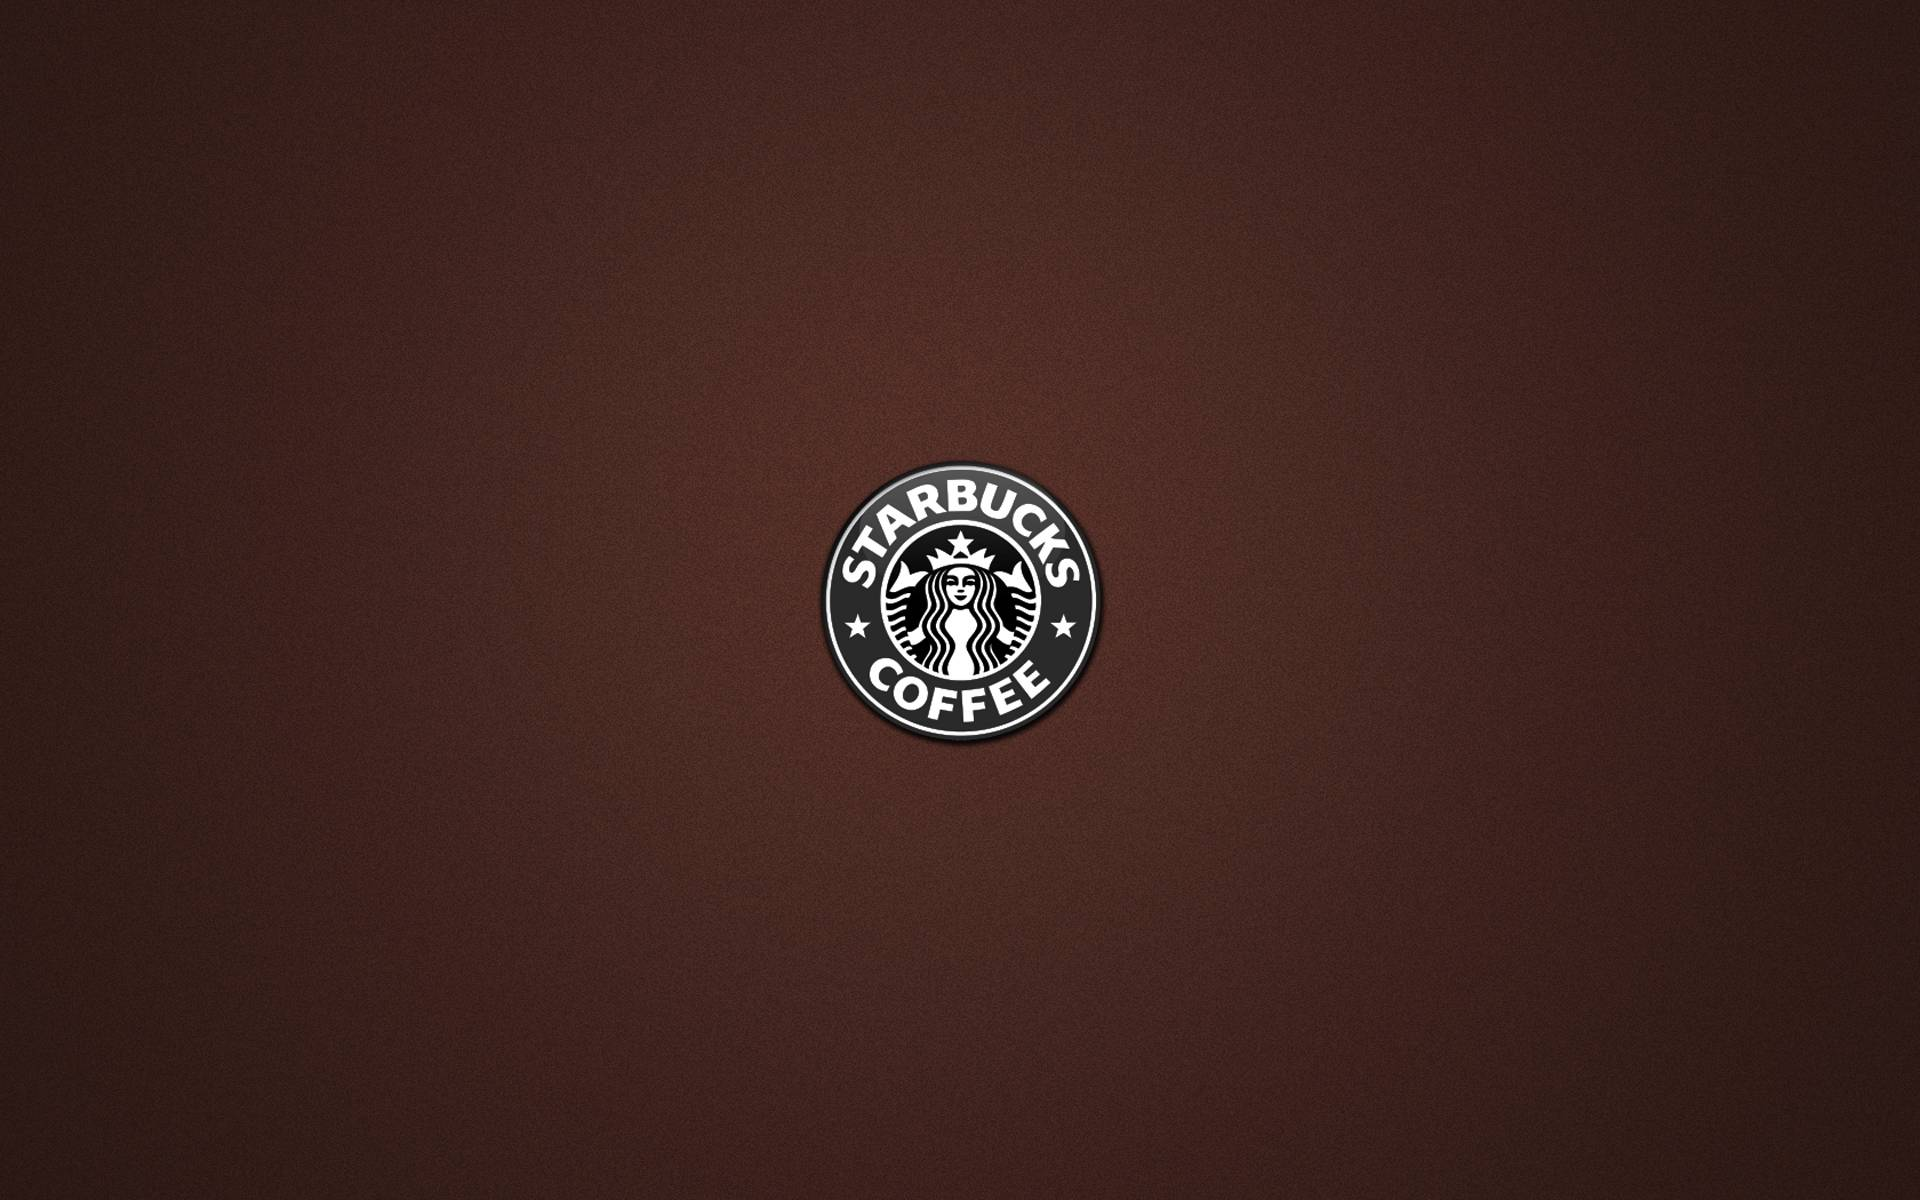 Starbucks Wallpapers - Full HD wallpaper search